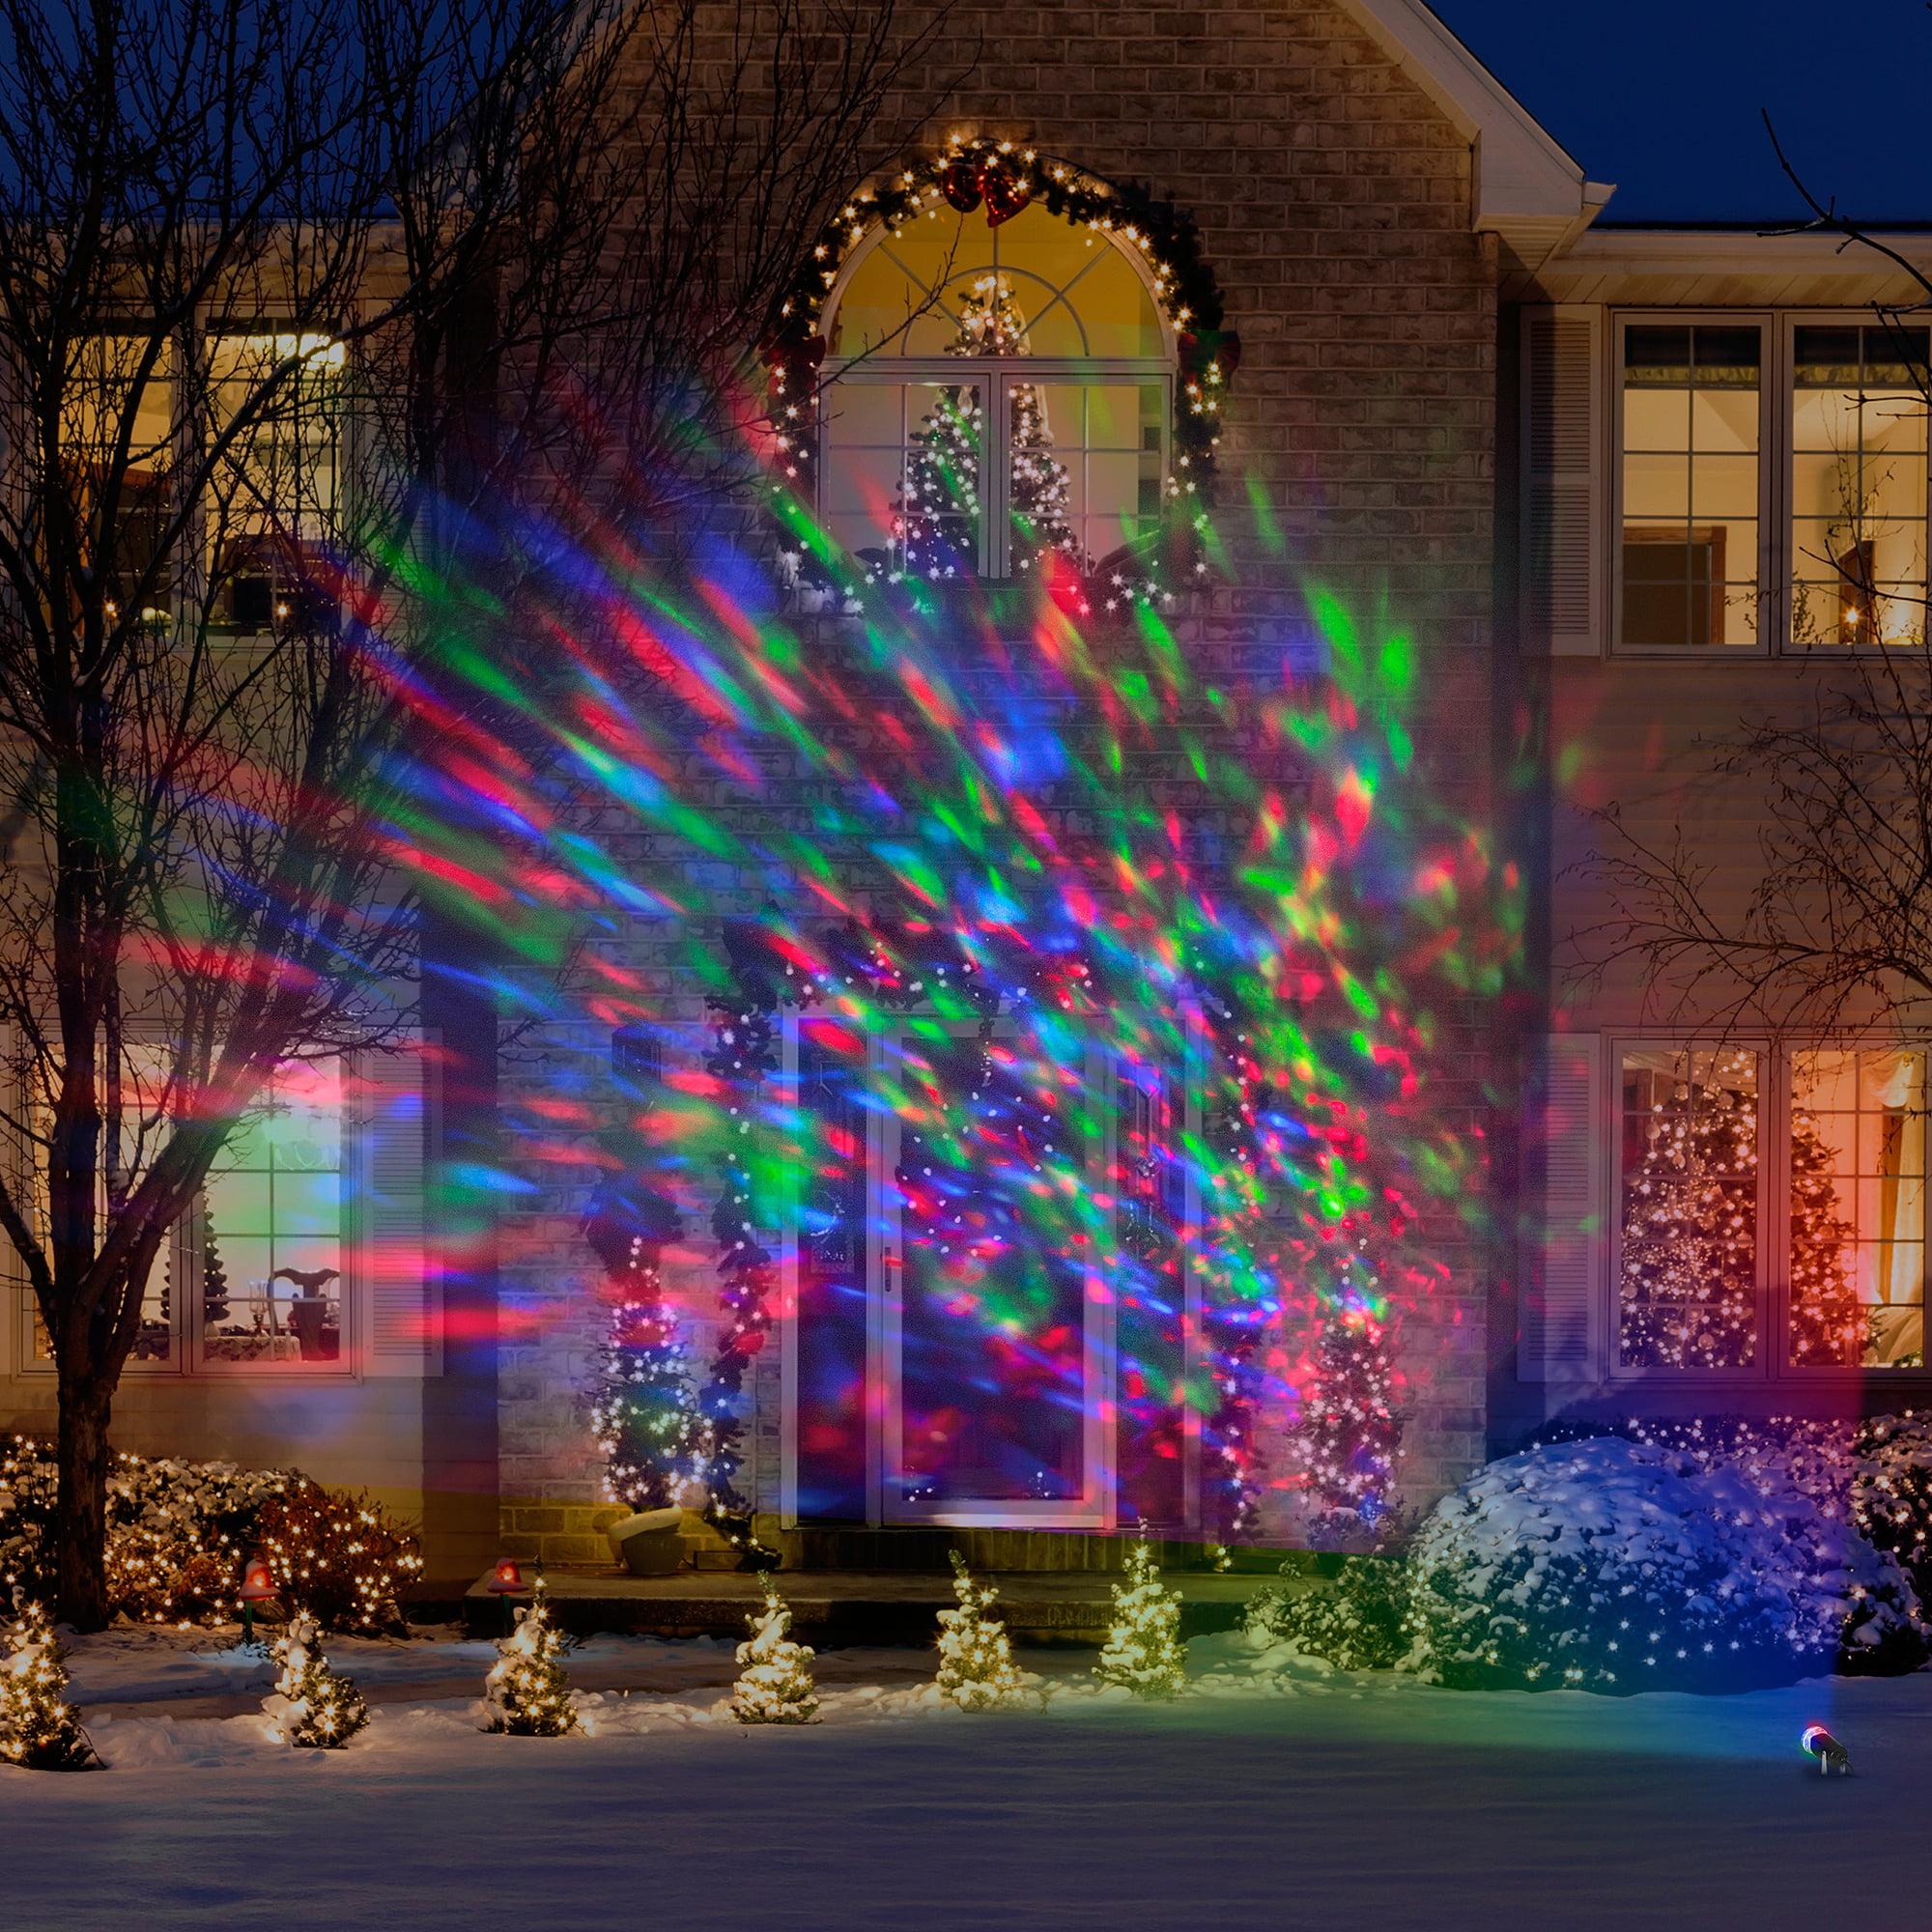 lightshow kaleidoscope multi colored christmas lights walmart